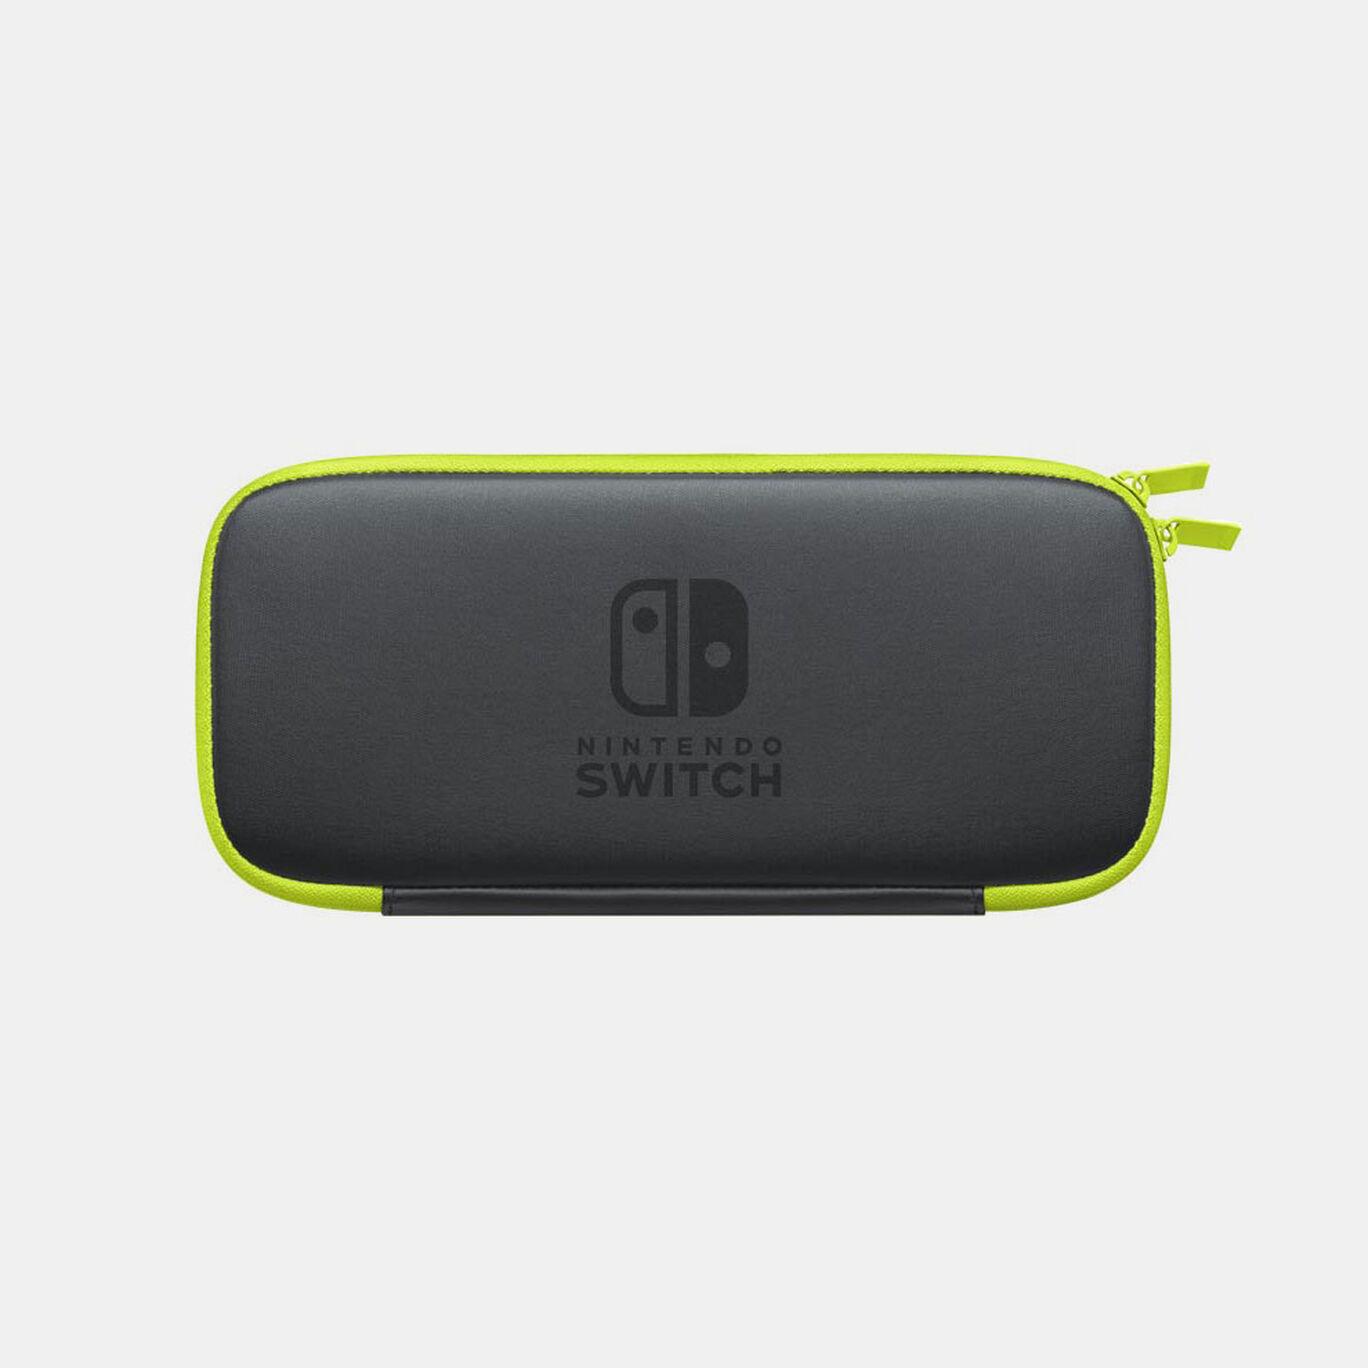 Nintendo Switchキャリングケース ネオンイエロー (画面保護シート付き)